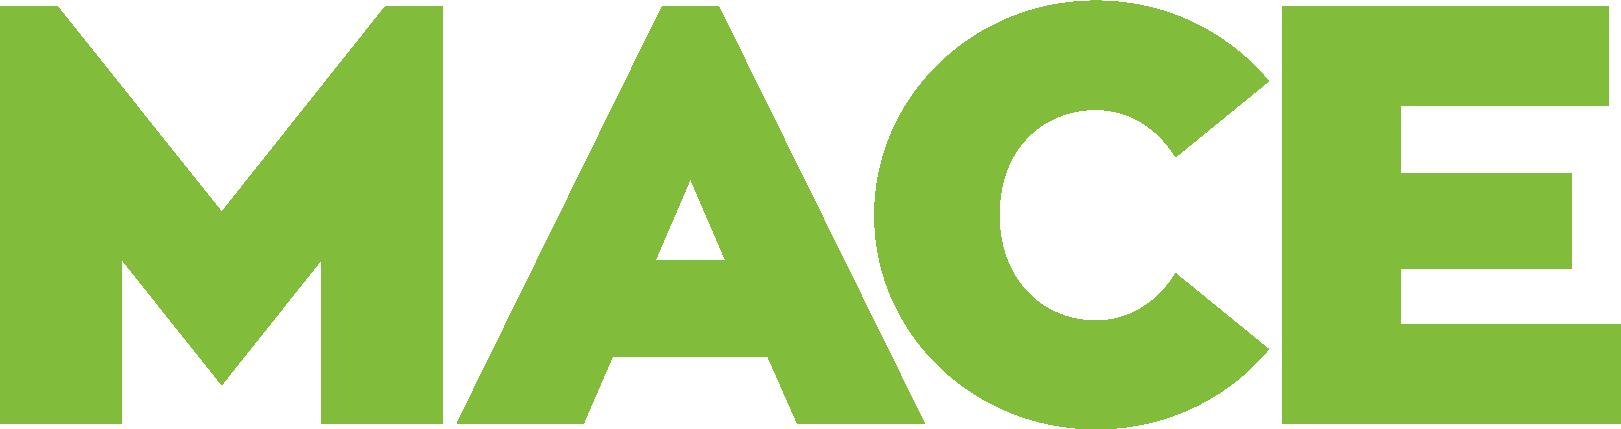 MACE SOTF Green logo